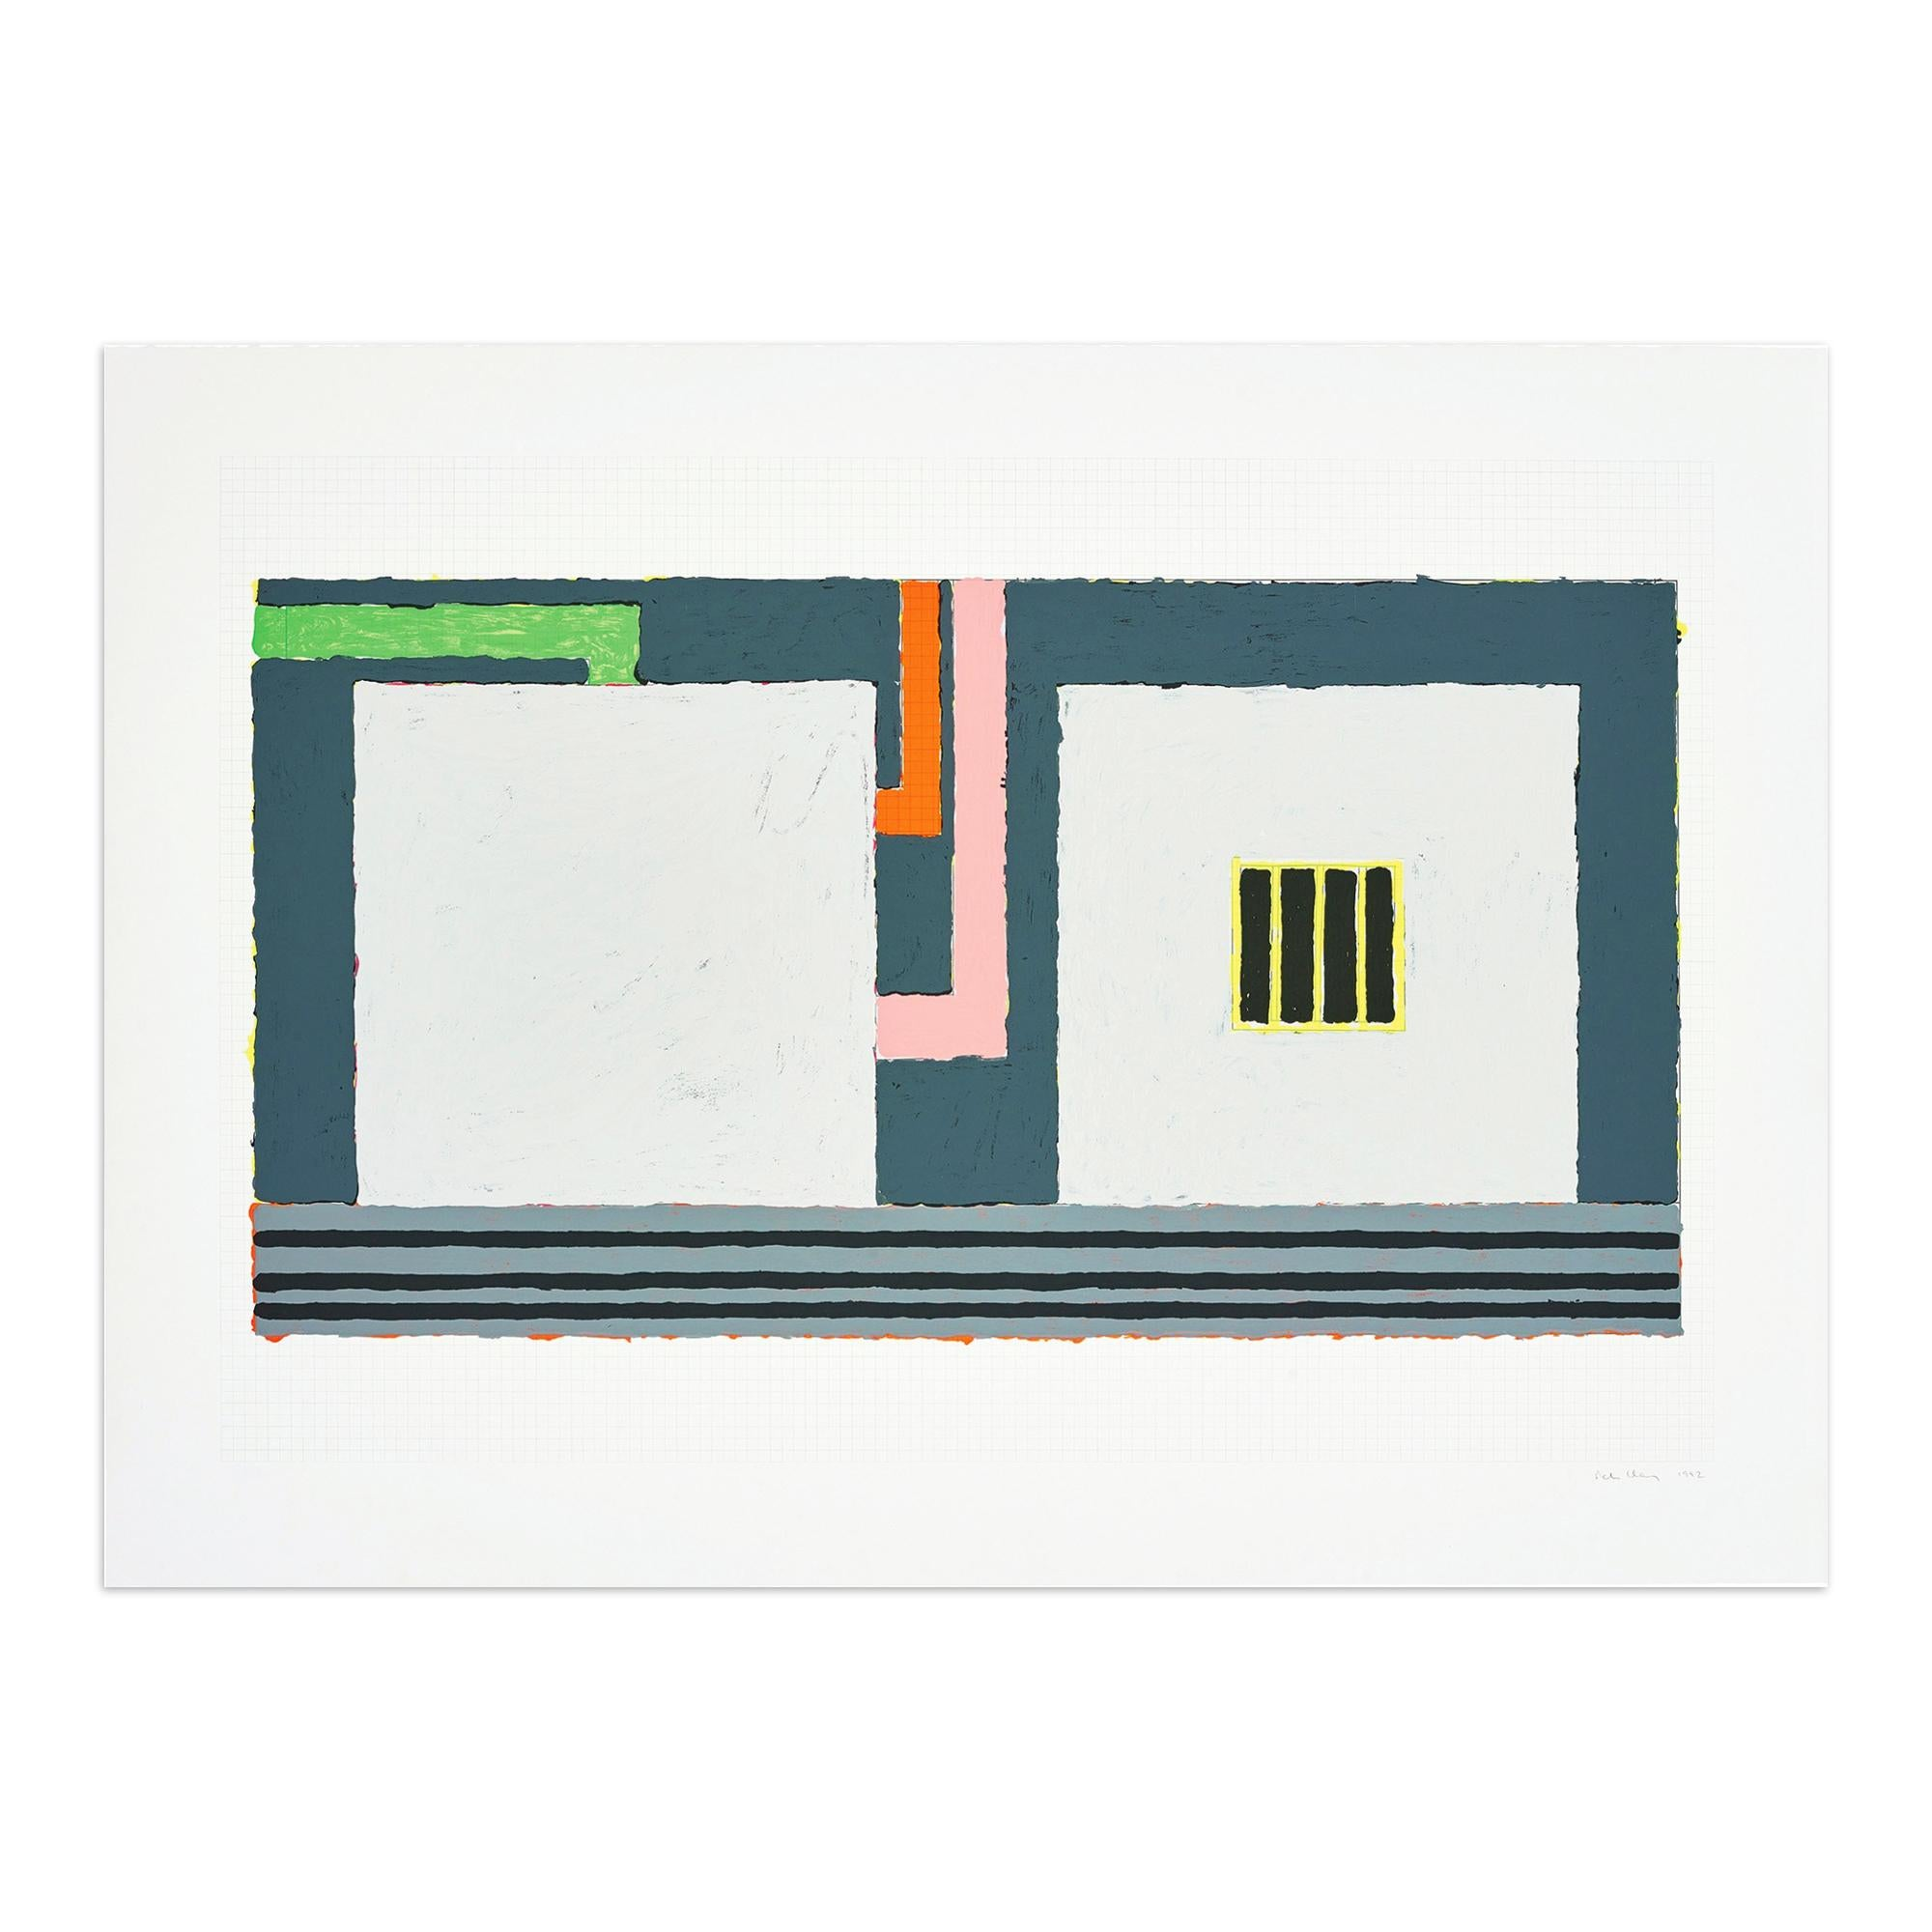 Elsewhere, Silkscreen in Colors, Abstract Art, Minimalism, Hard-Edge Art